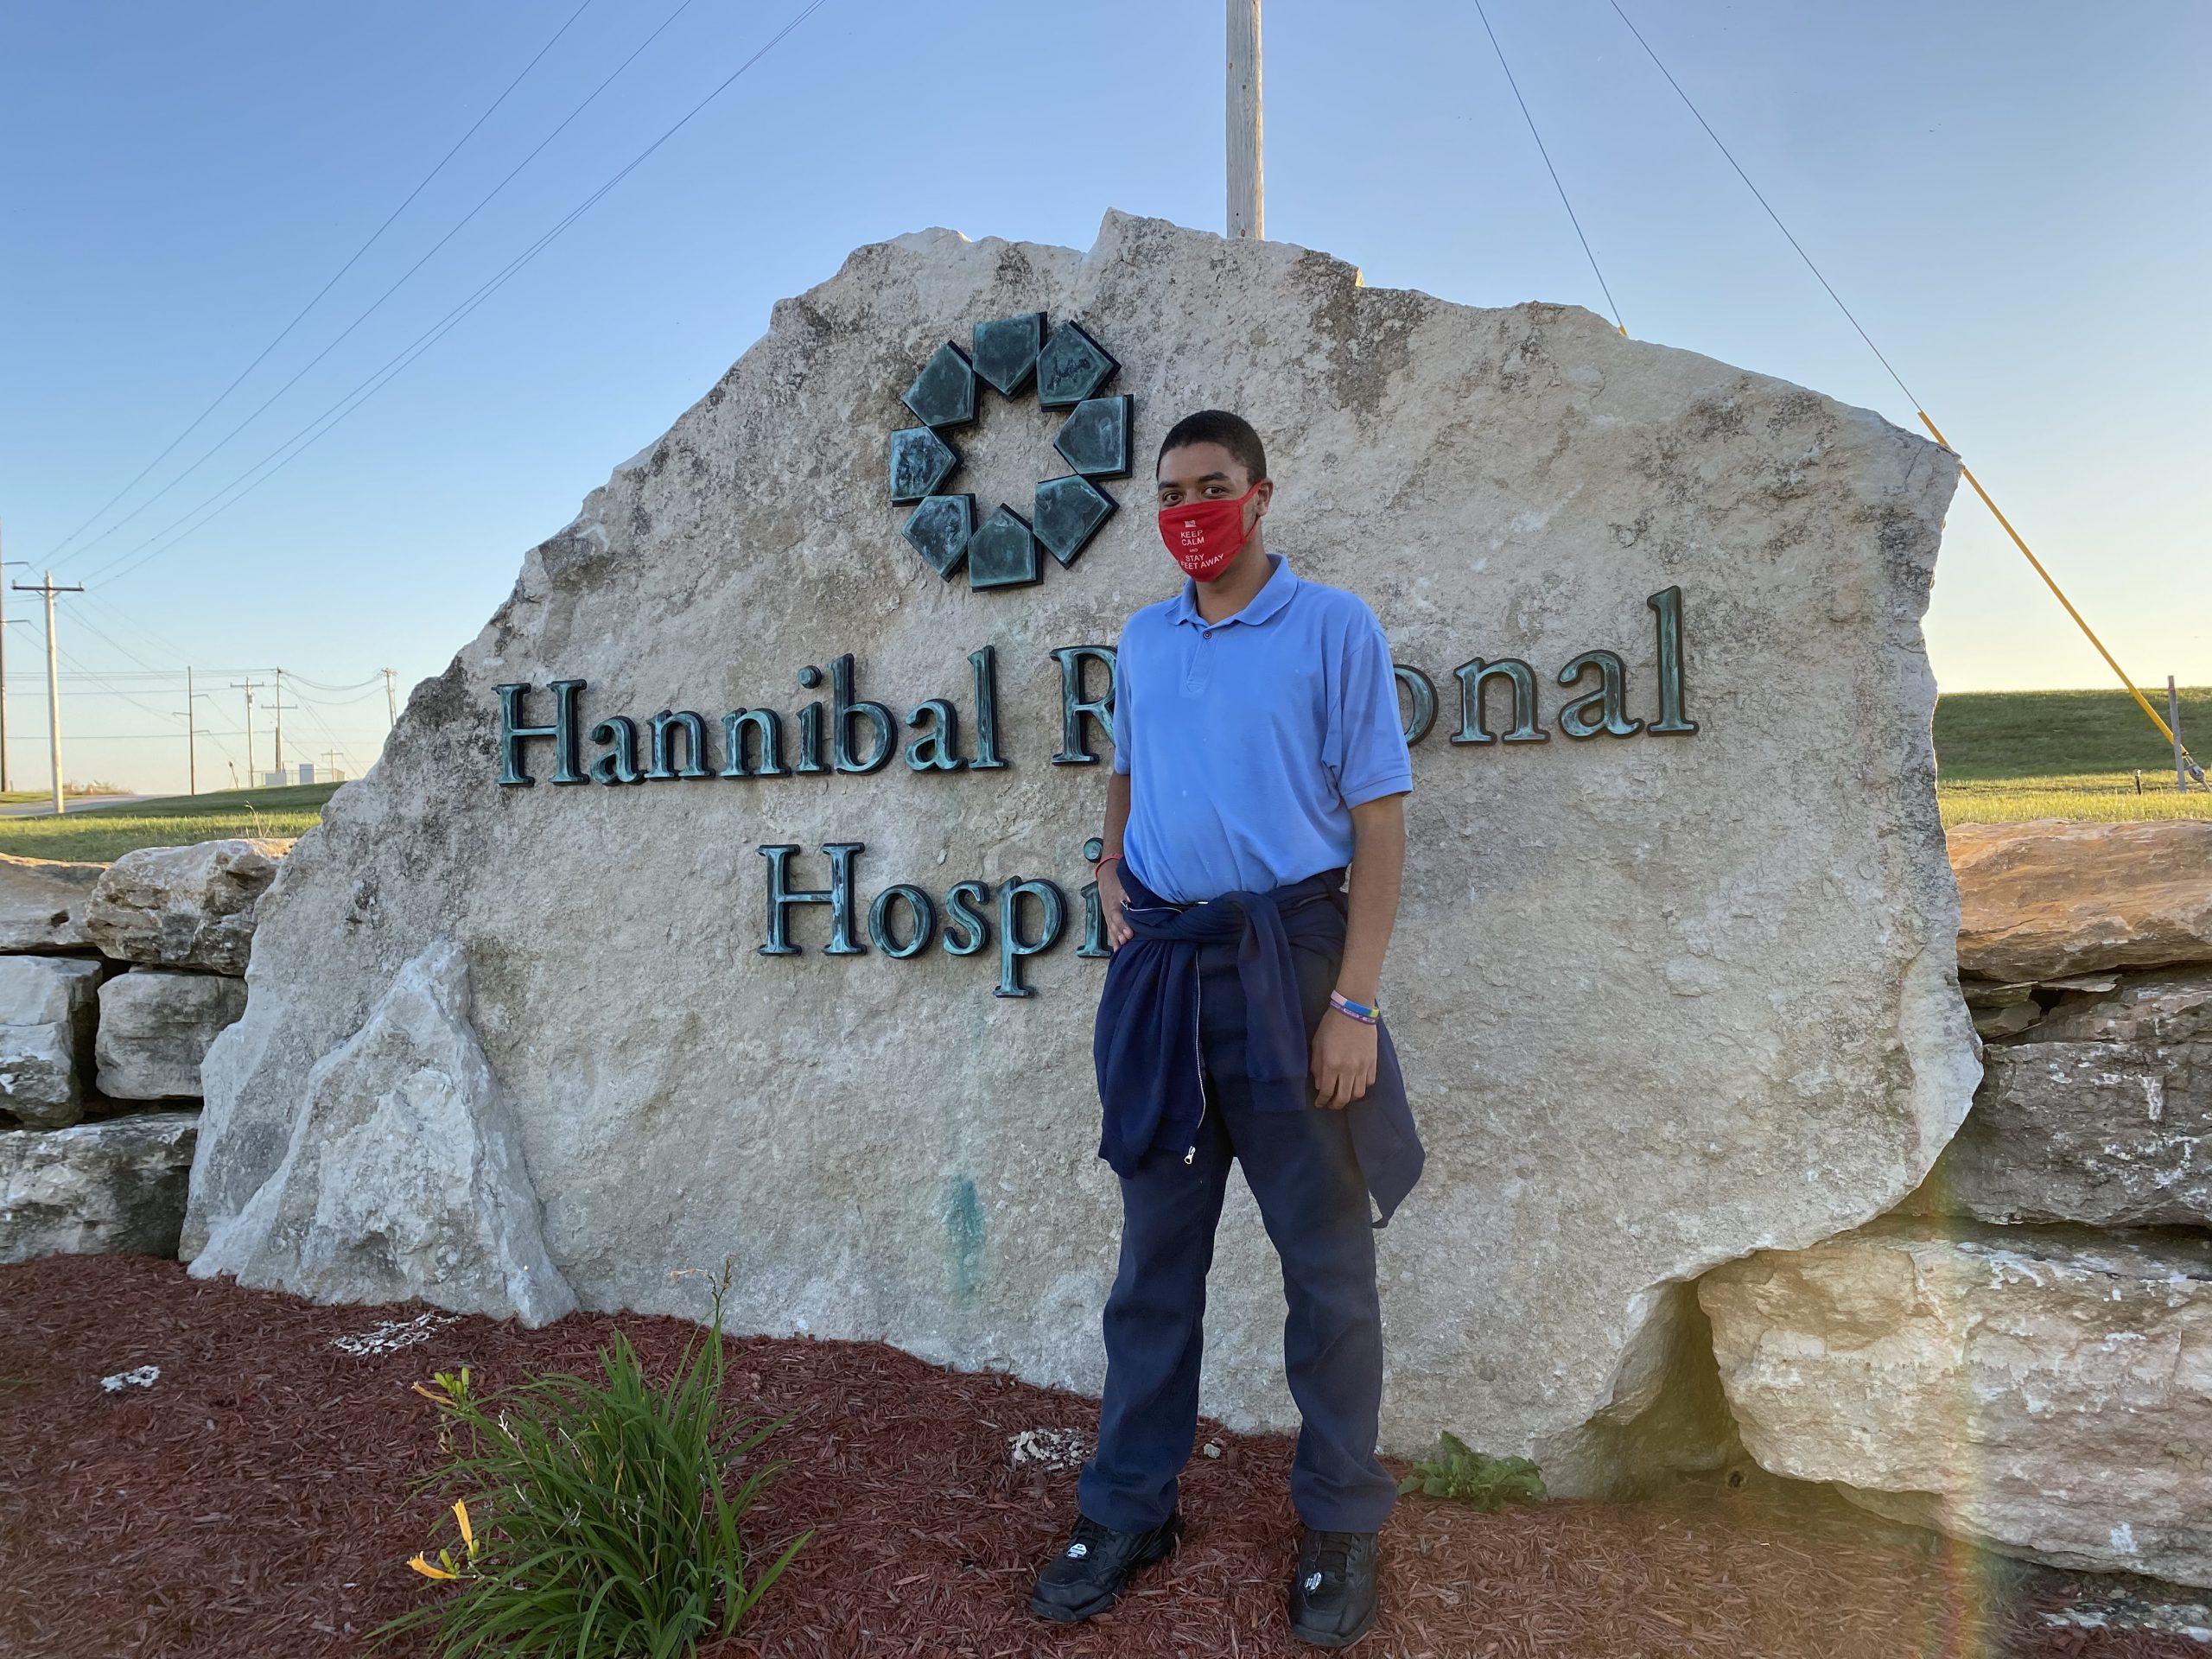 Keshod wearing a mask in front of Hannibal Regional Hospital.